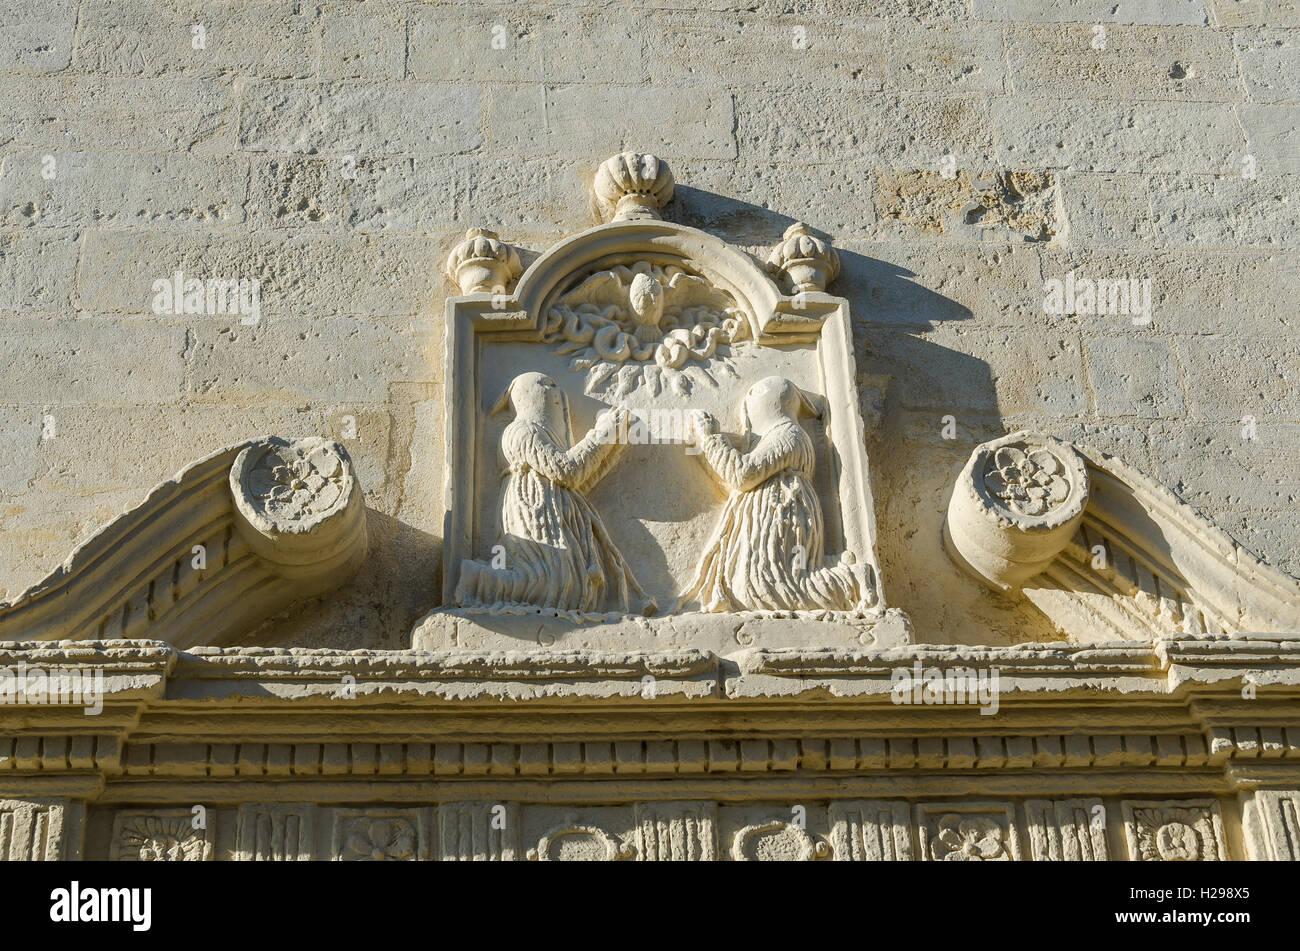 chapelle, Aigues Mortes, Gard, Provence, France - Stock Image